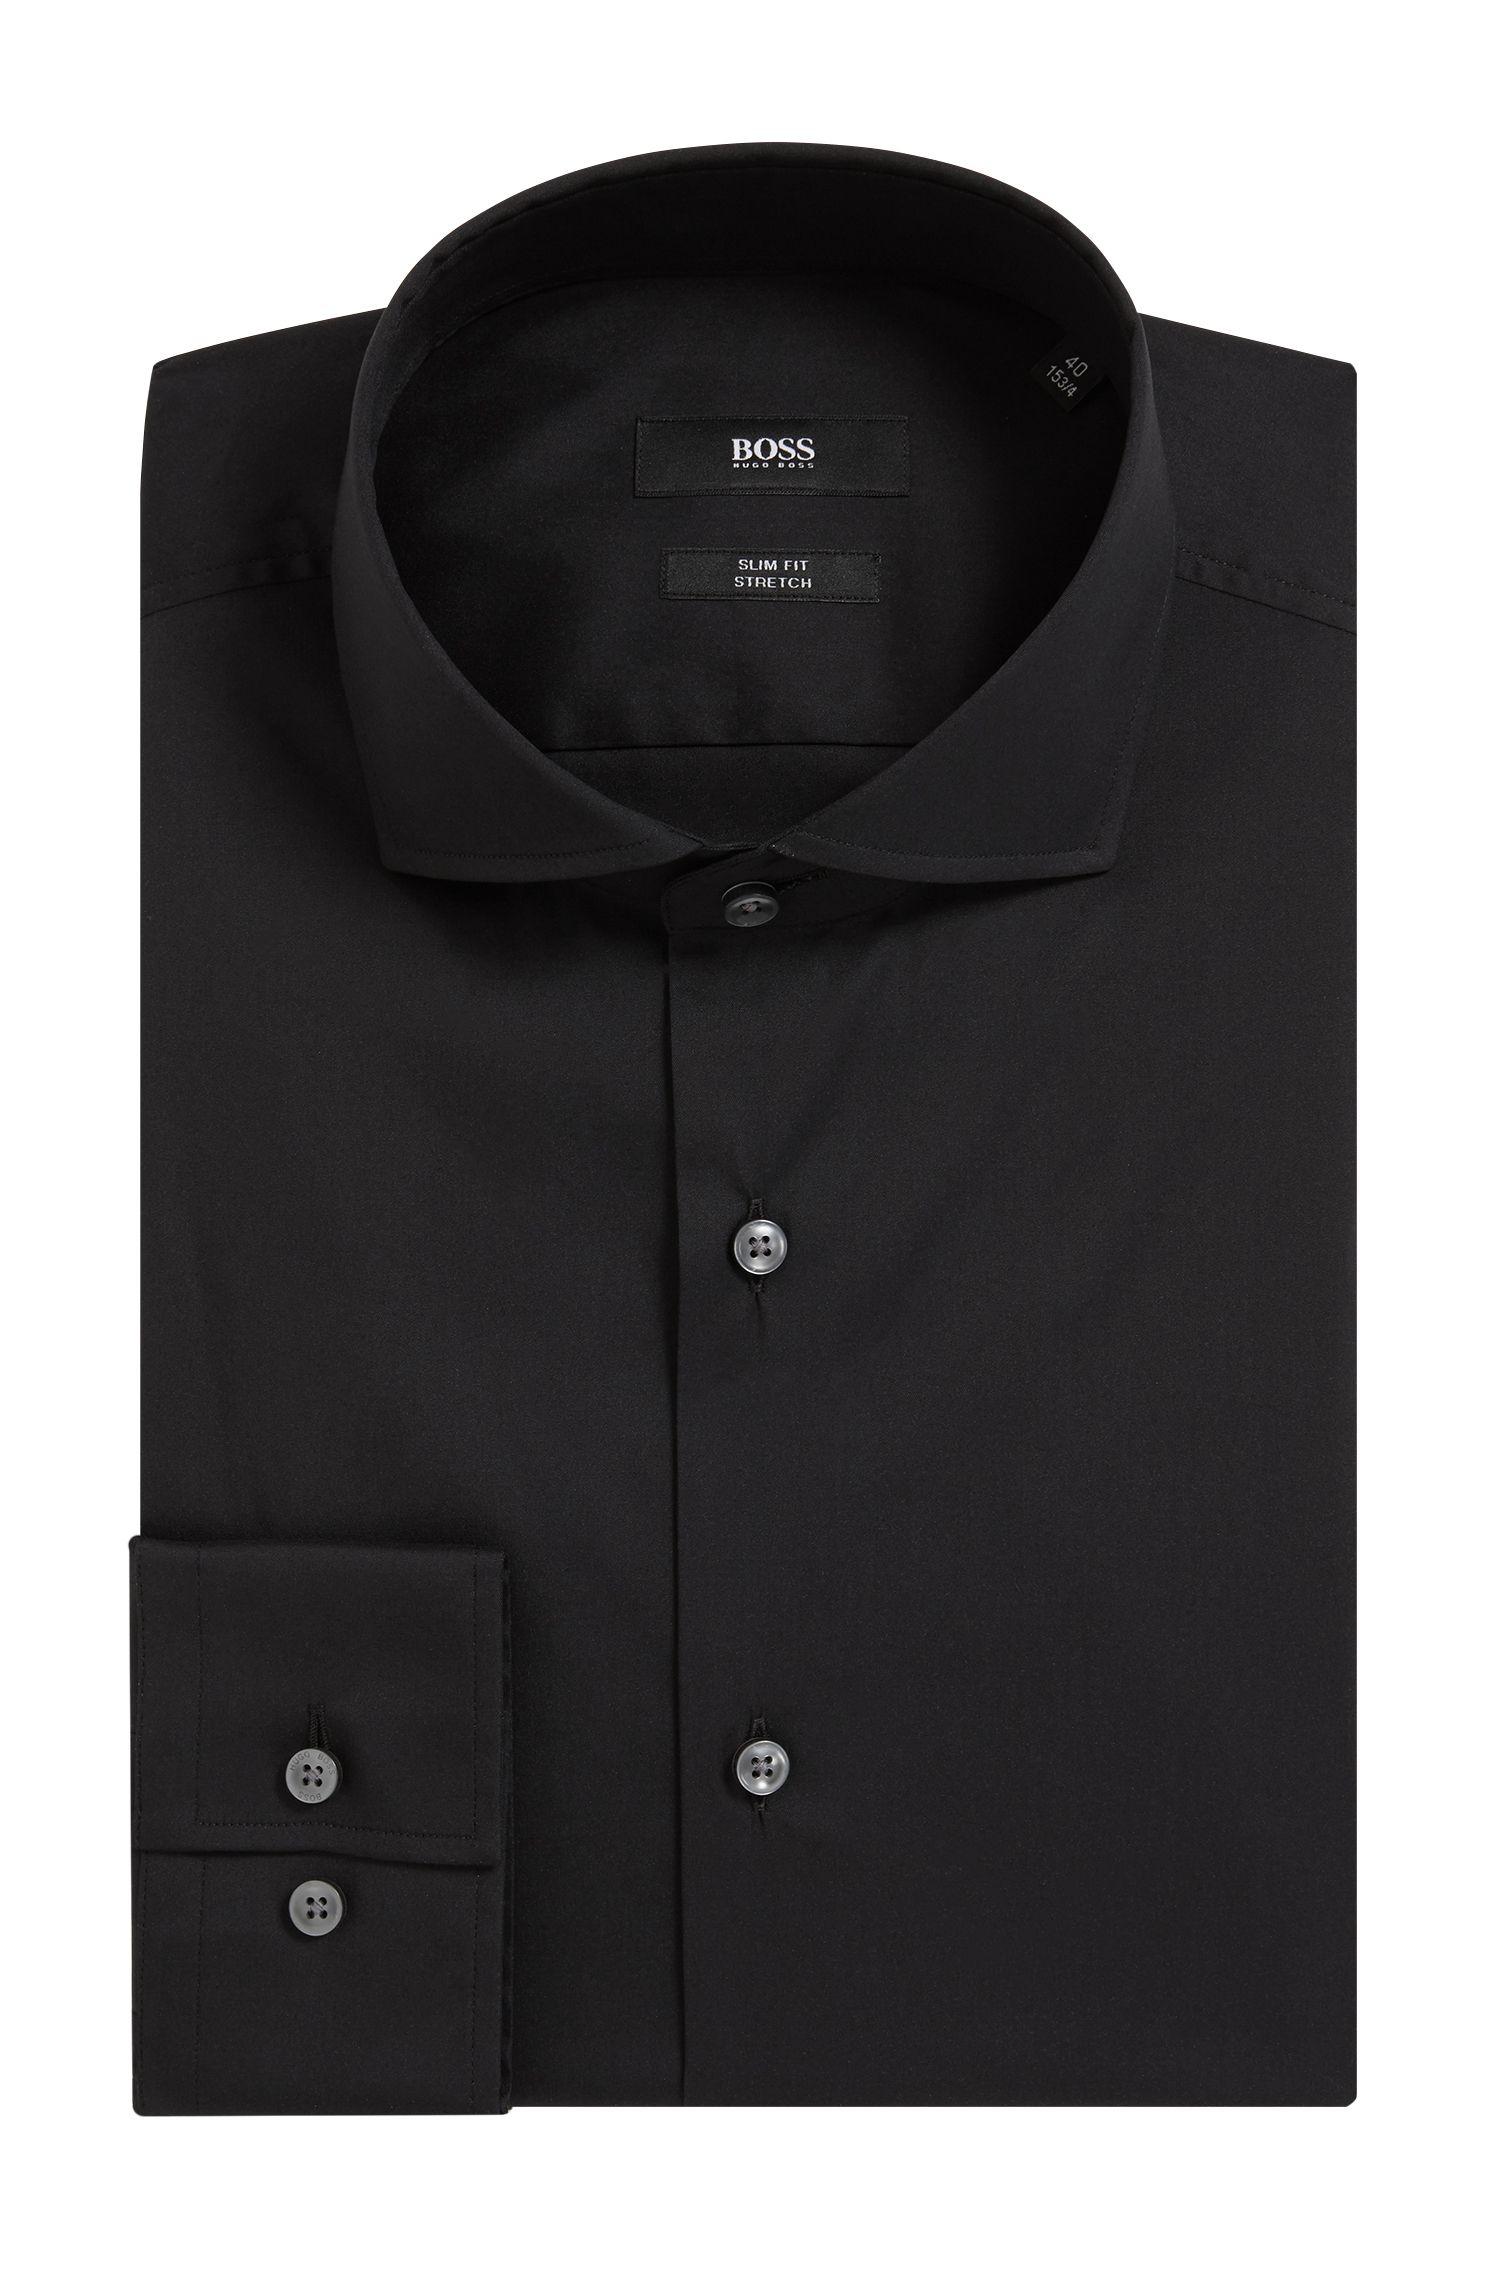 Spread Collar Stretch Cotton Dress Shirt, Slim Fit   Jason